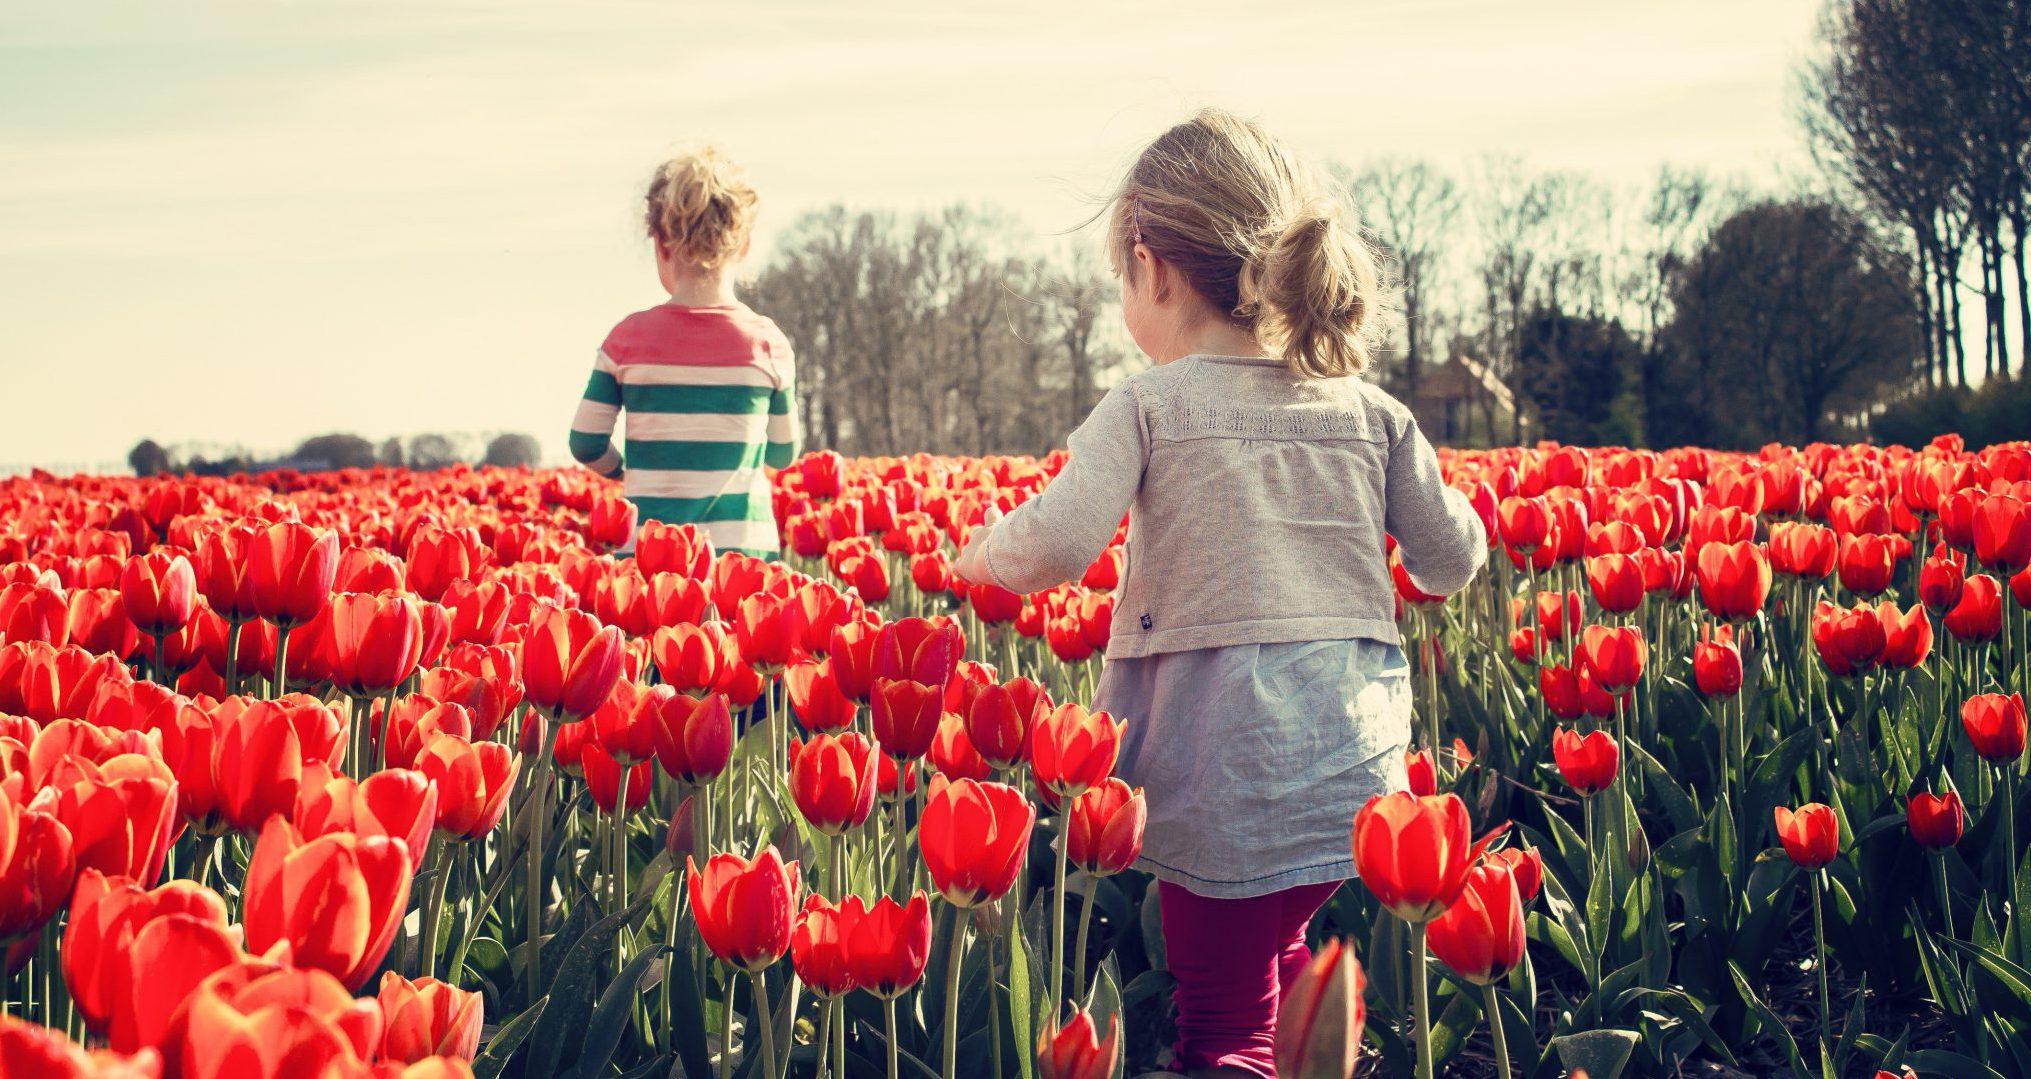 kinderen tussen tulpen